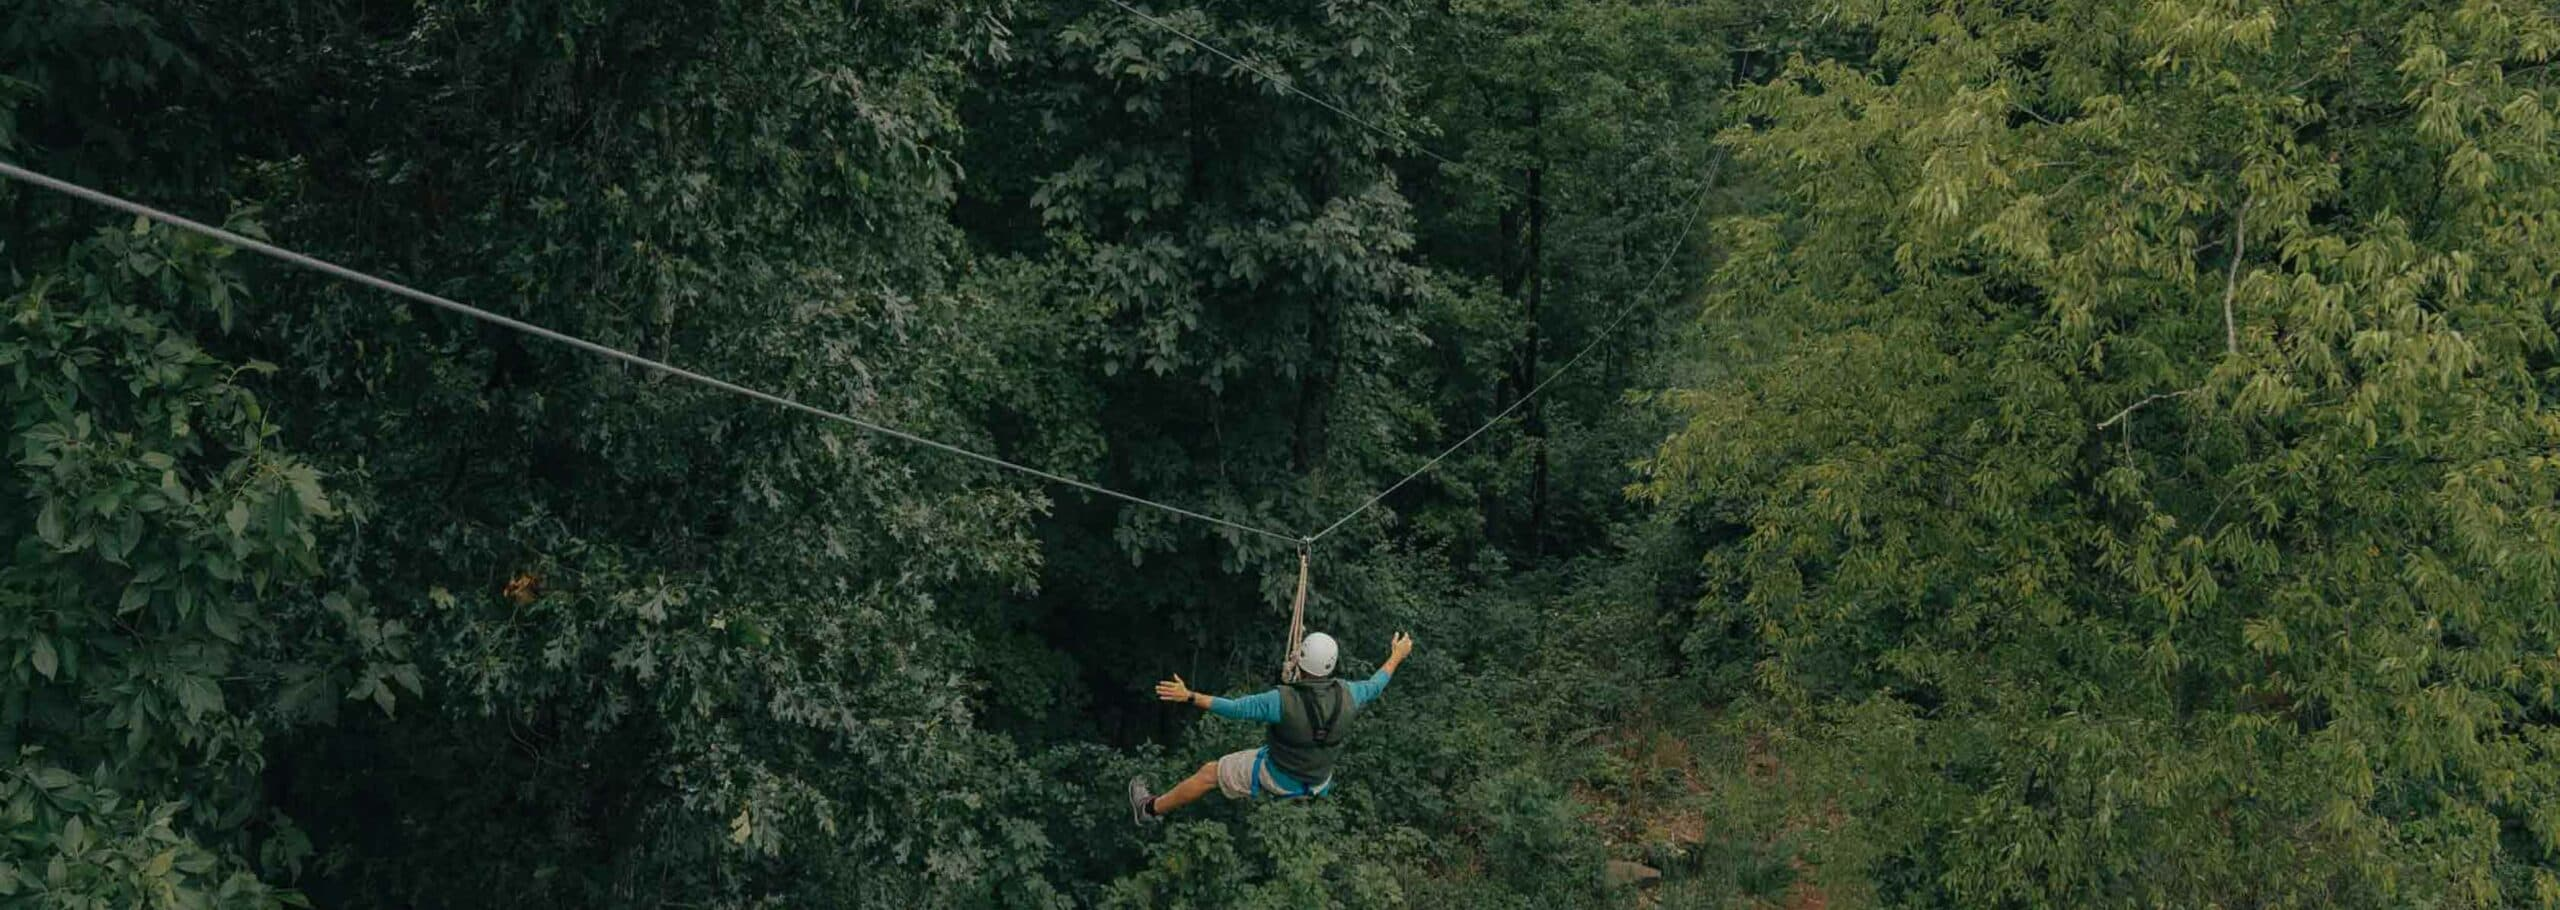 adult ziplining through trees